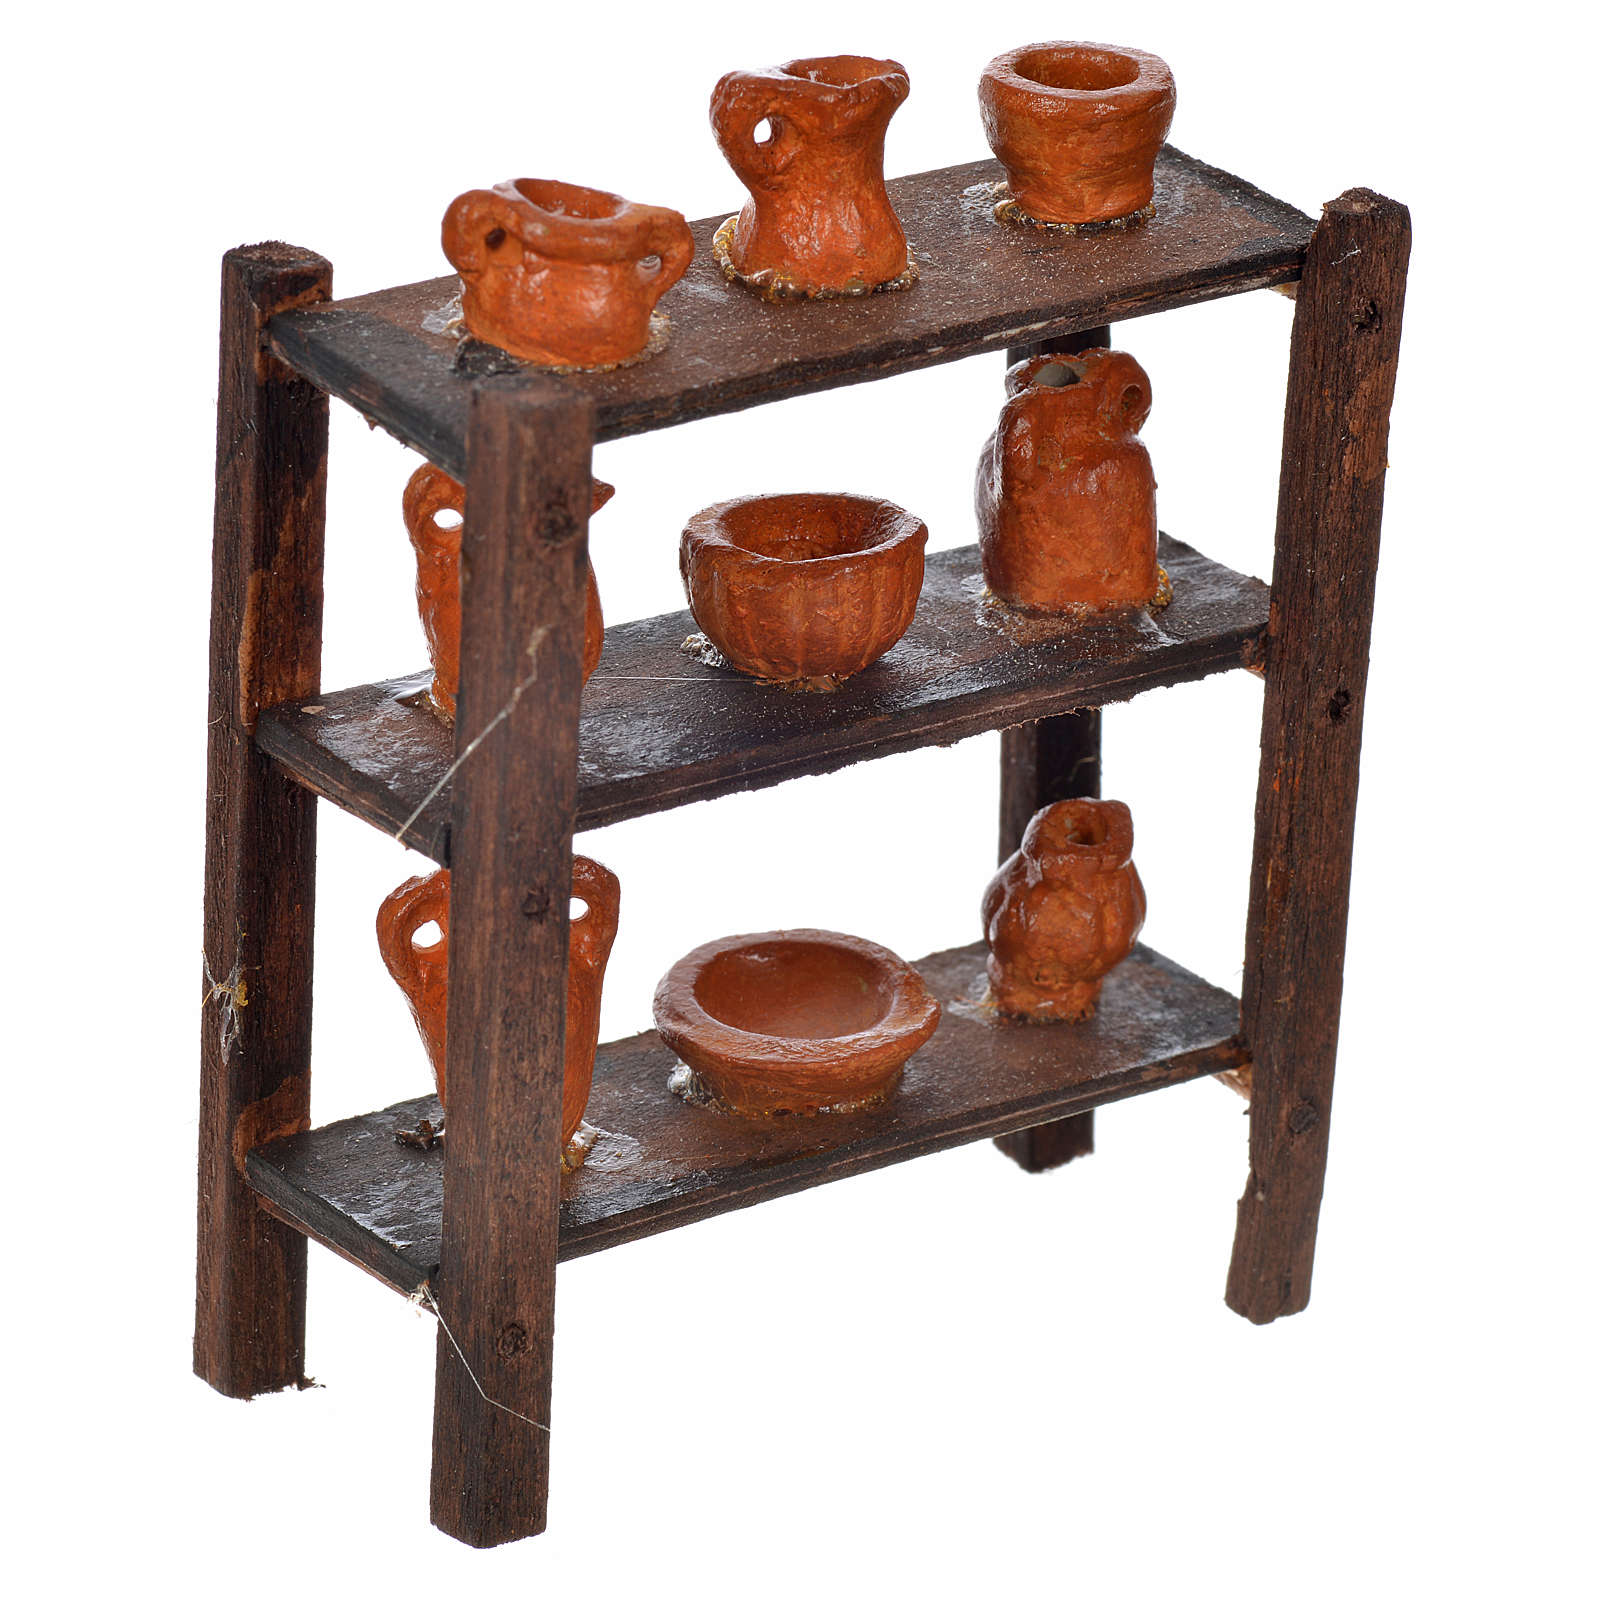 Scaffale vasame terracotta presepe napoletano 7x6x3 cm 4